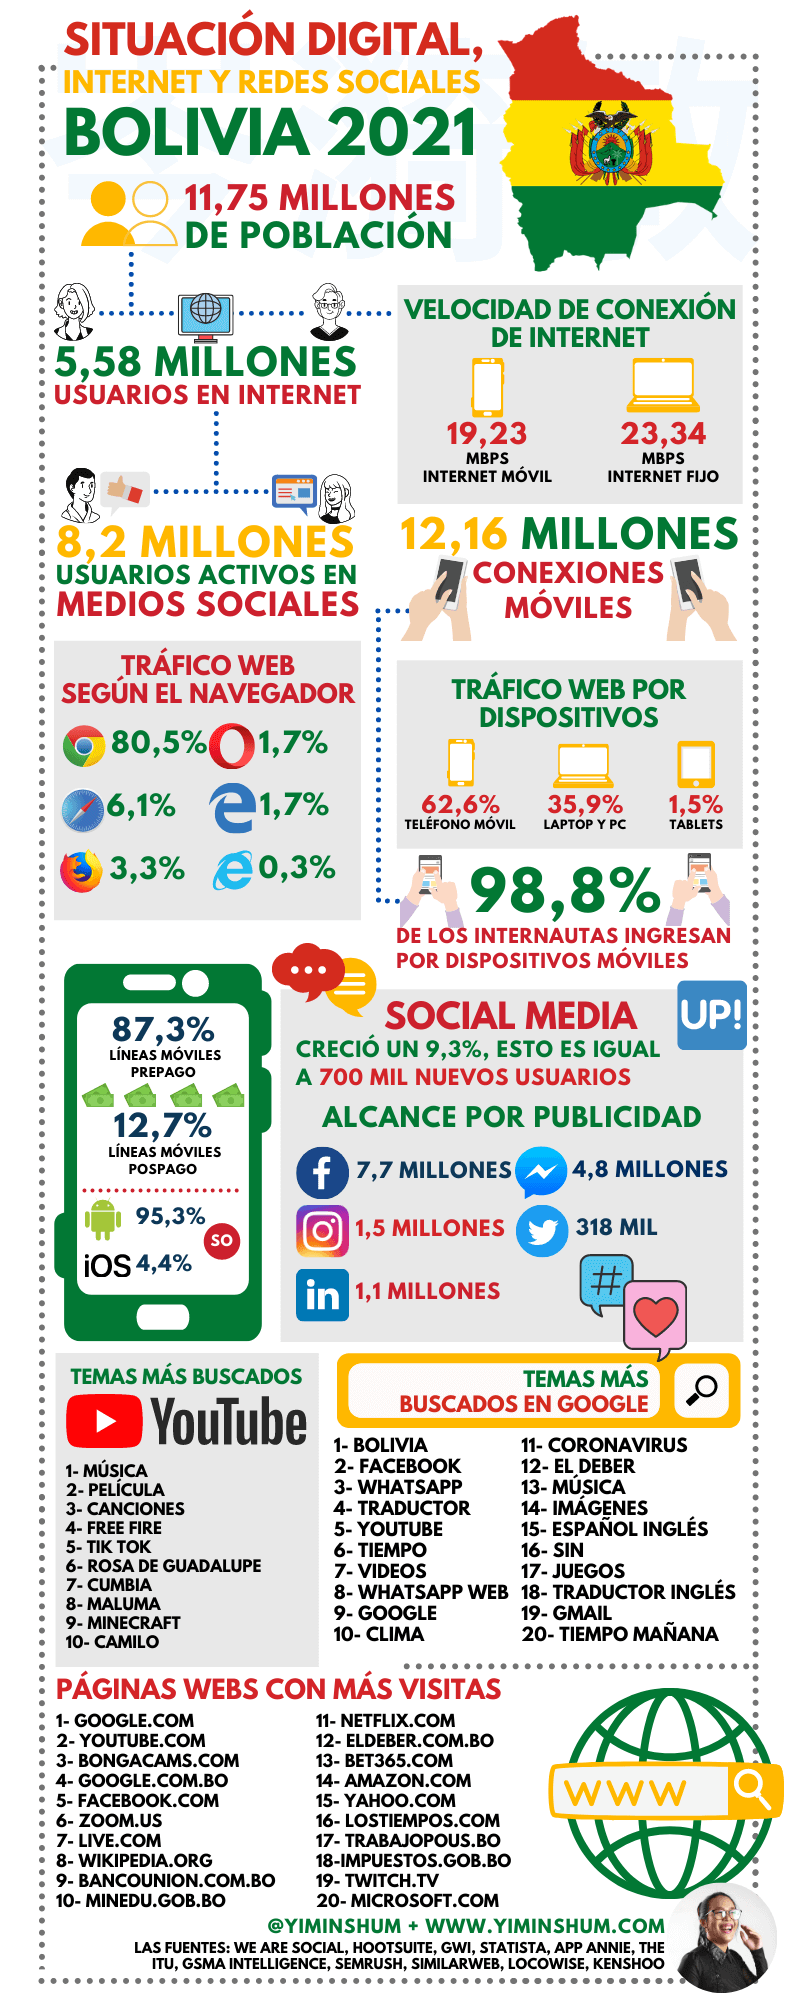 Internet y redes sociales en Bolivia 2021 #infografia #infographic #socialmedia